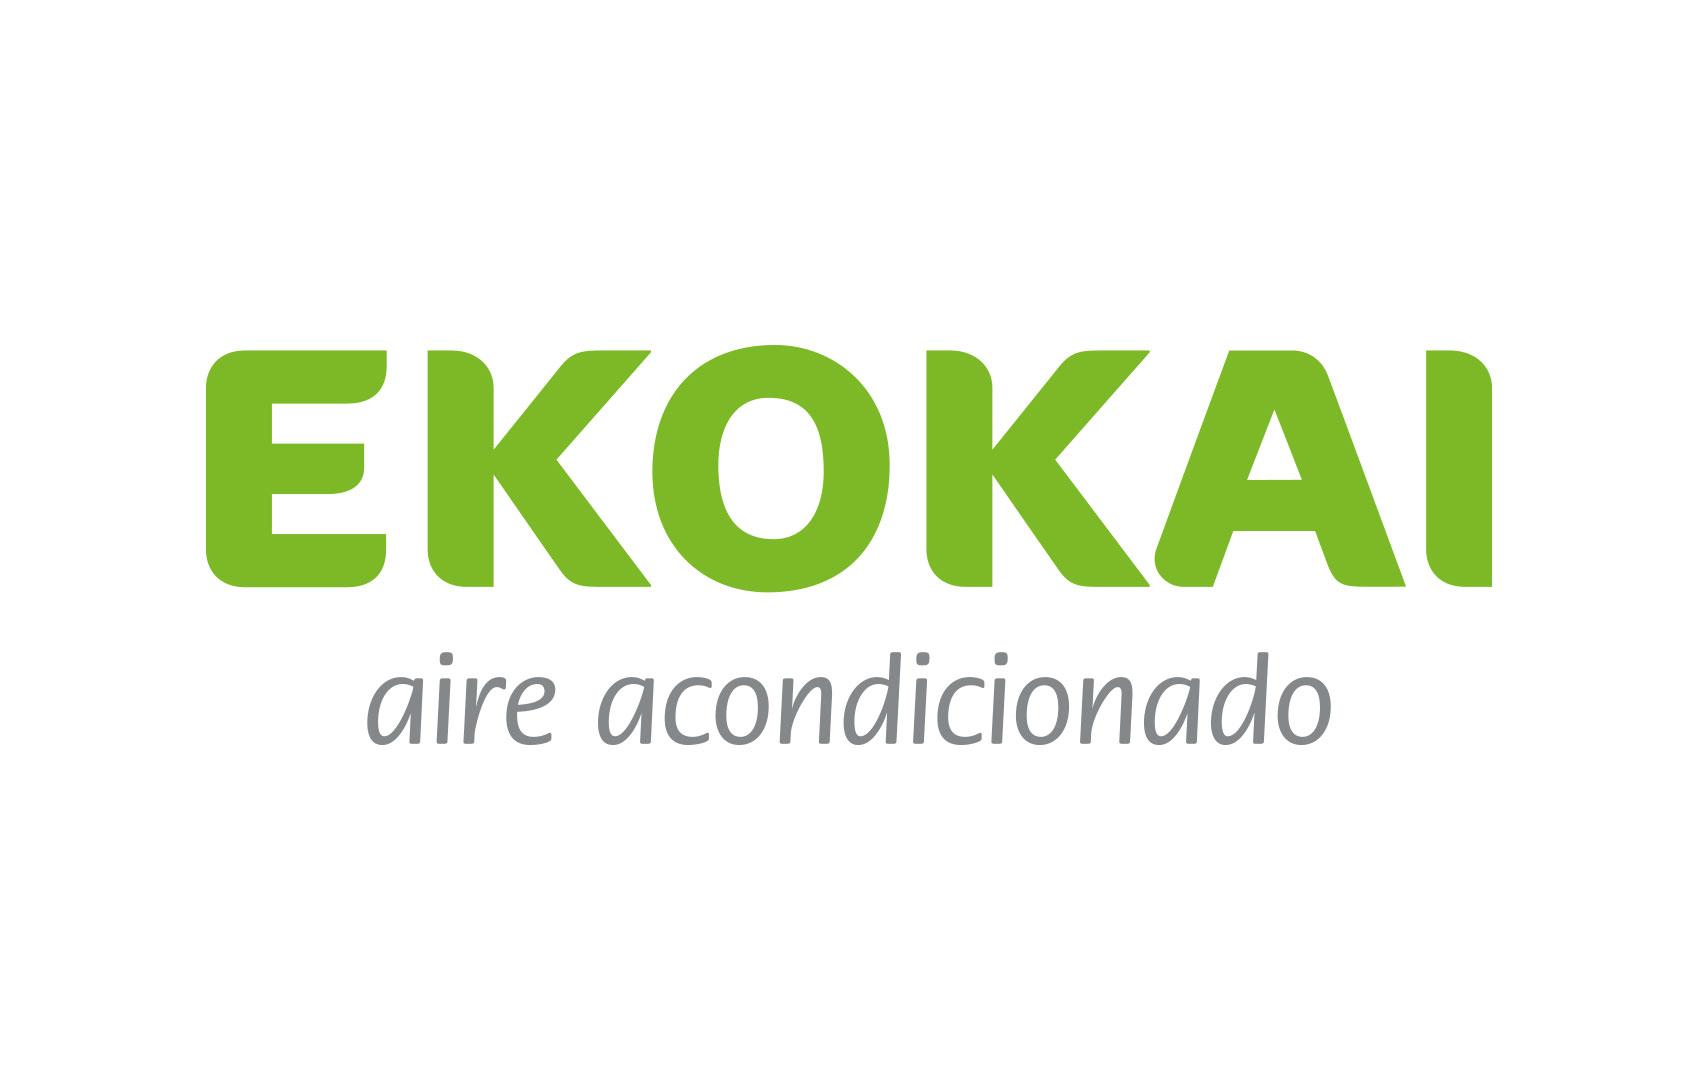 ident-ekokai-01.jpg